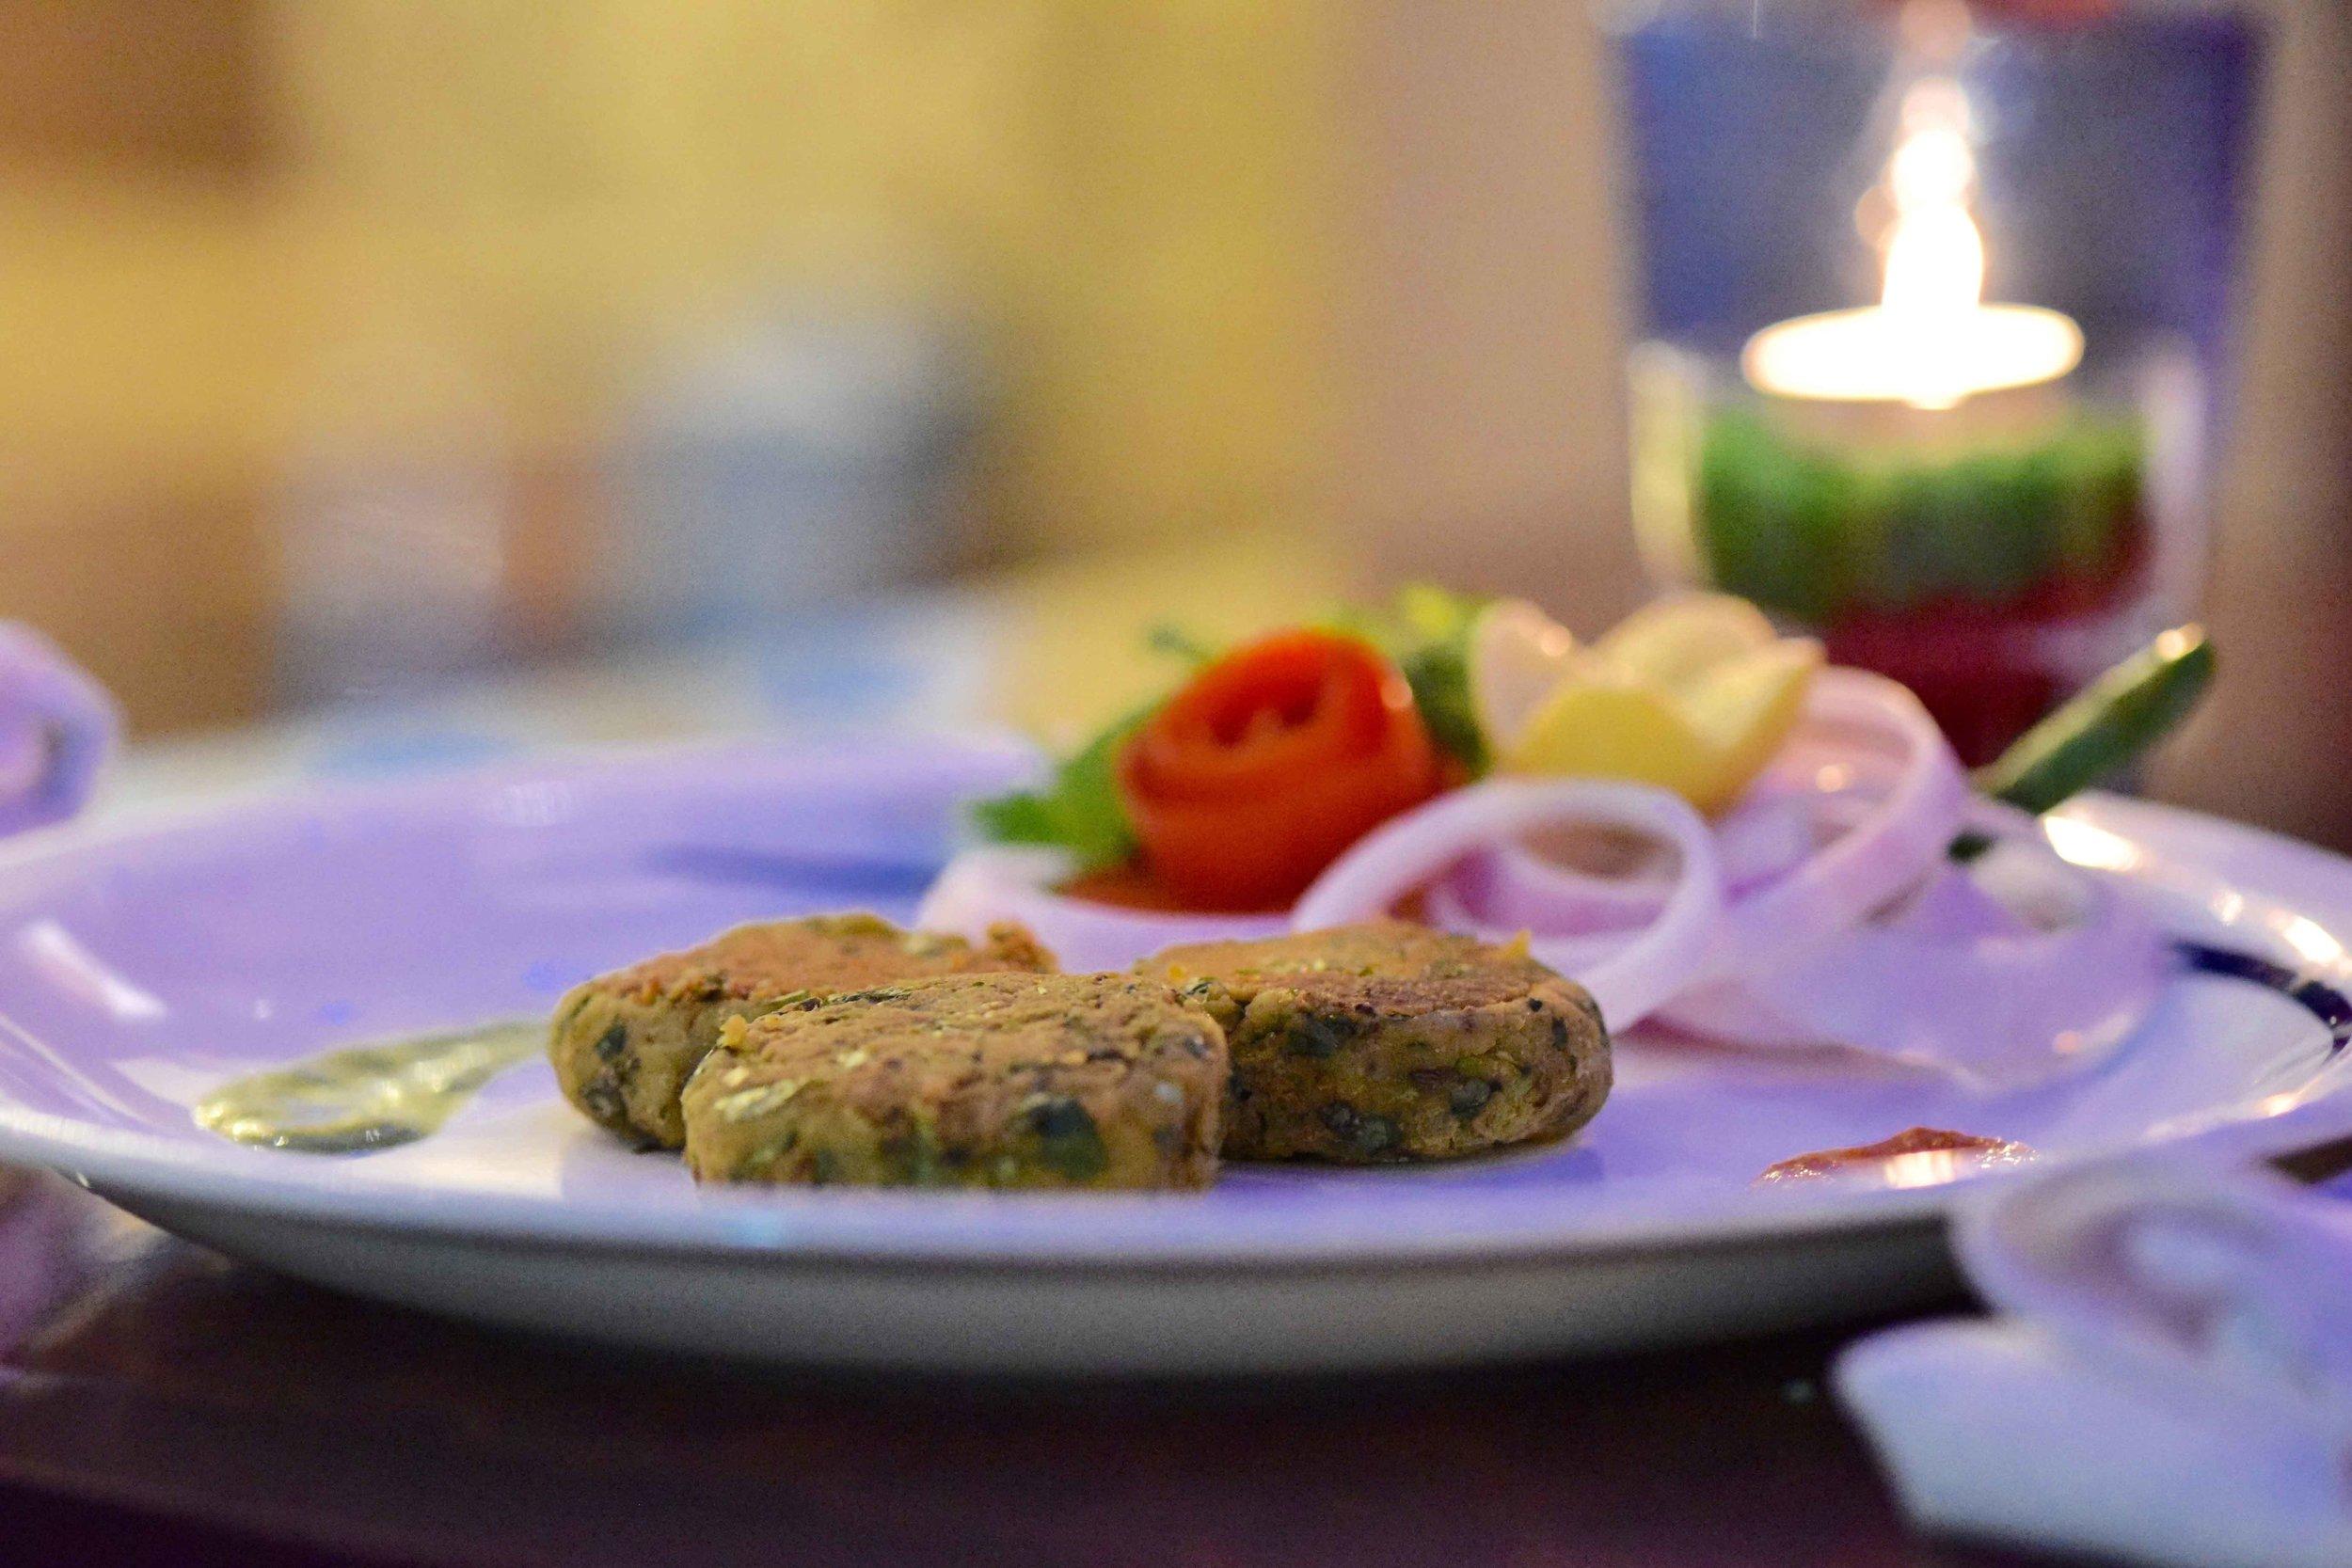 Radisson Blu Hotel, Kabab Factory, Ranchi, Jharkhand, India. Image©sourcingstyle.com.